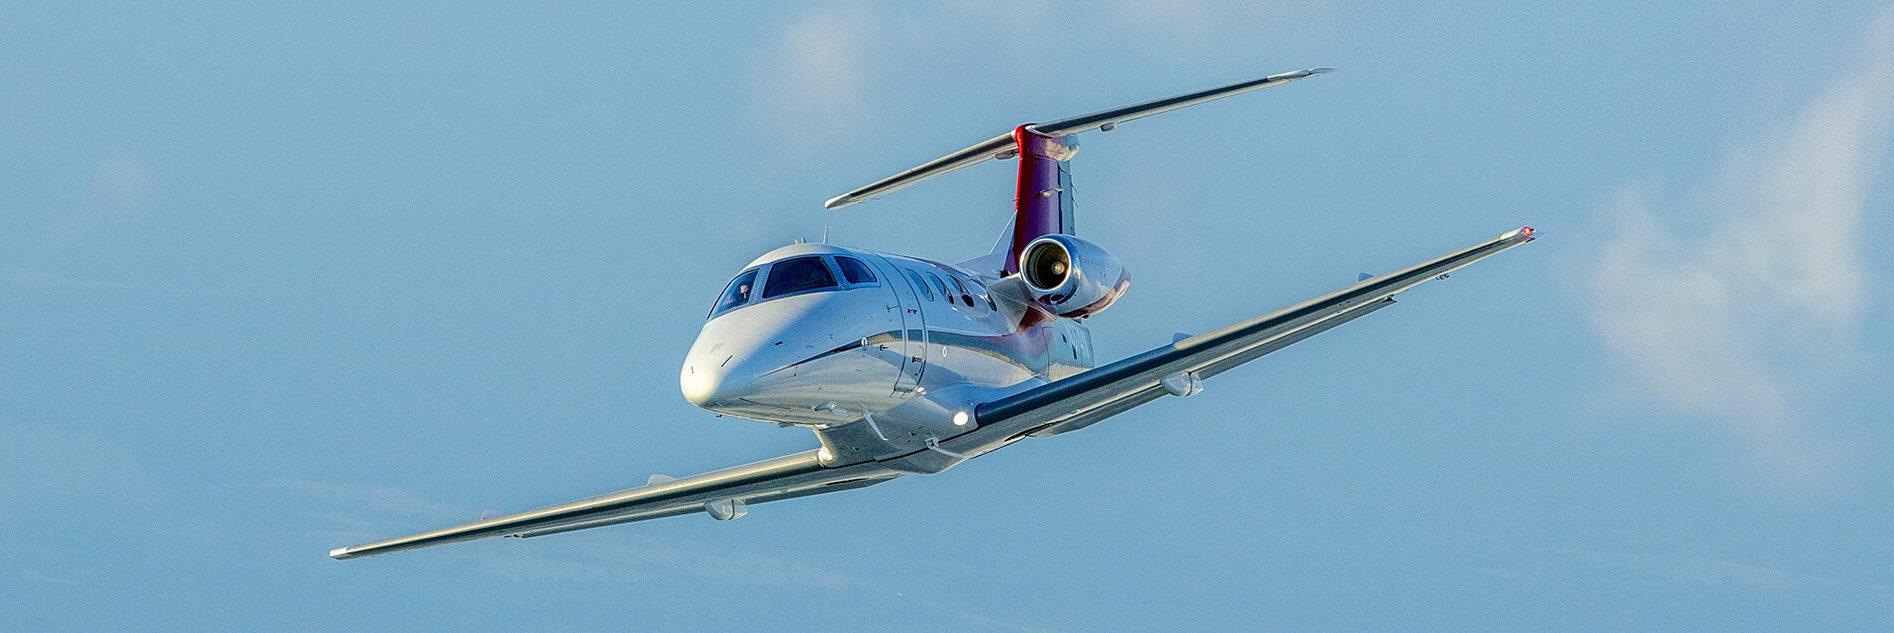 Embraer Phenom 100 Aerial Photo